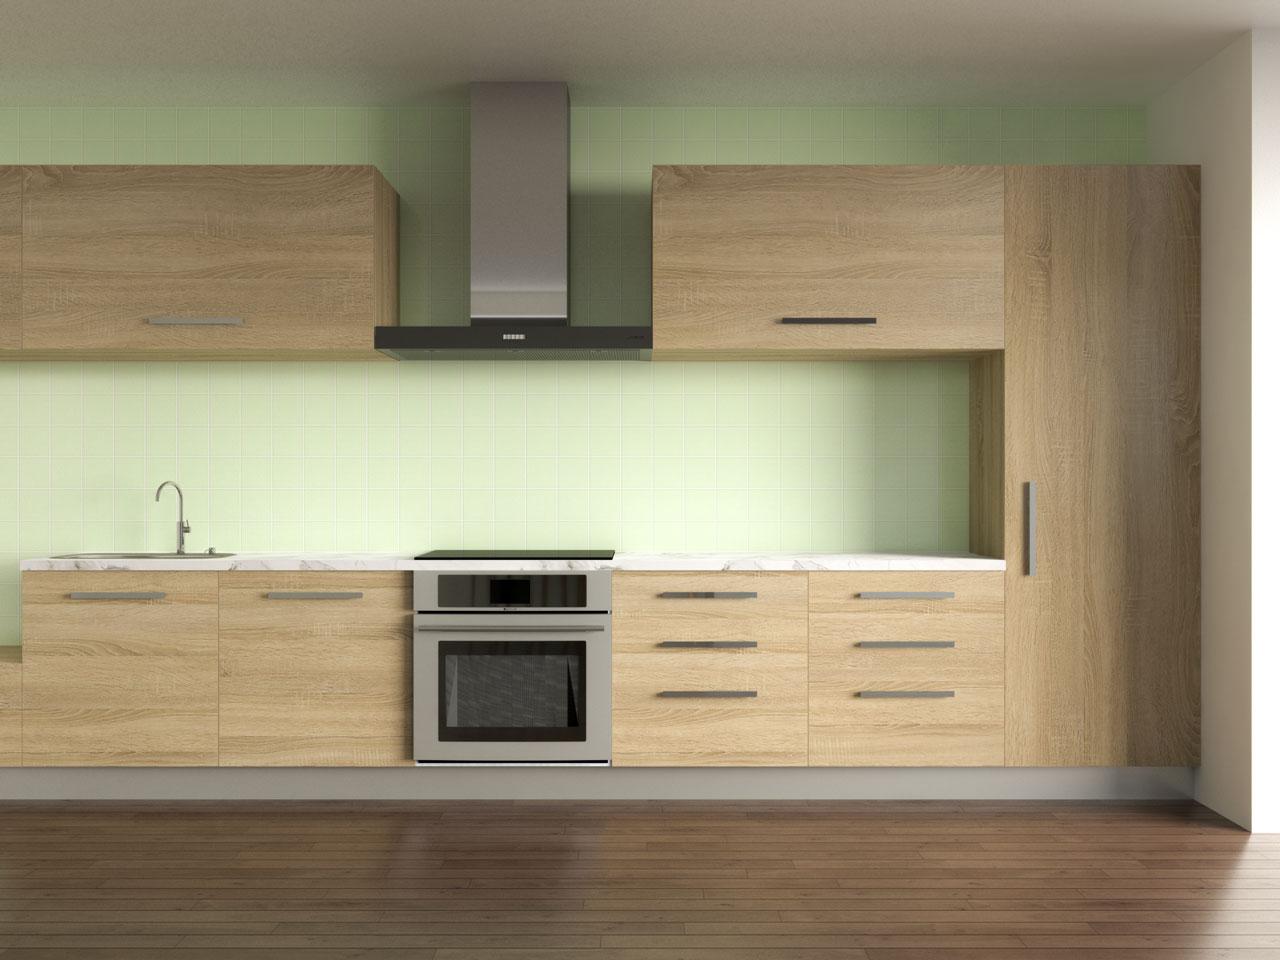 Nyanza backsplash with oak cabinets